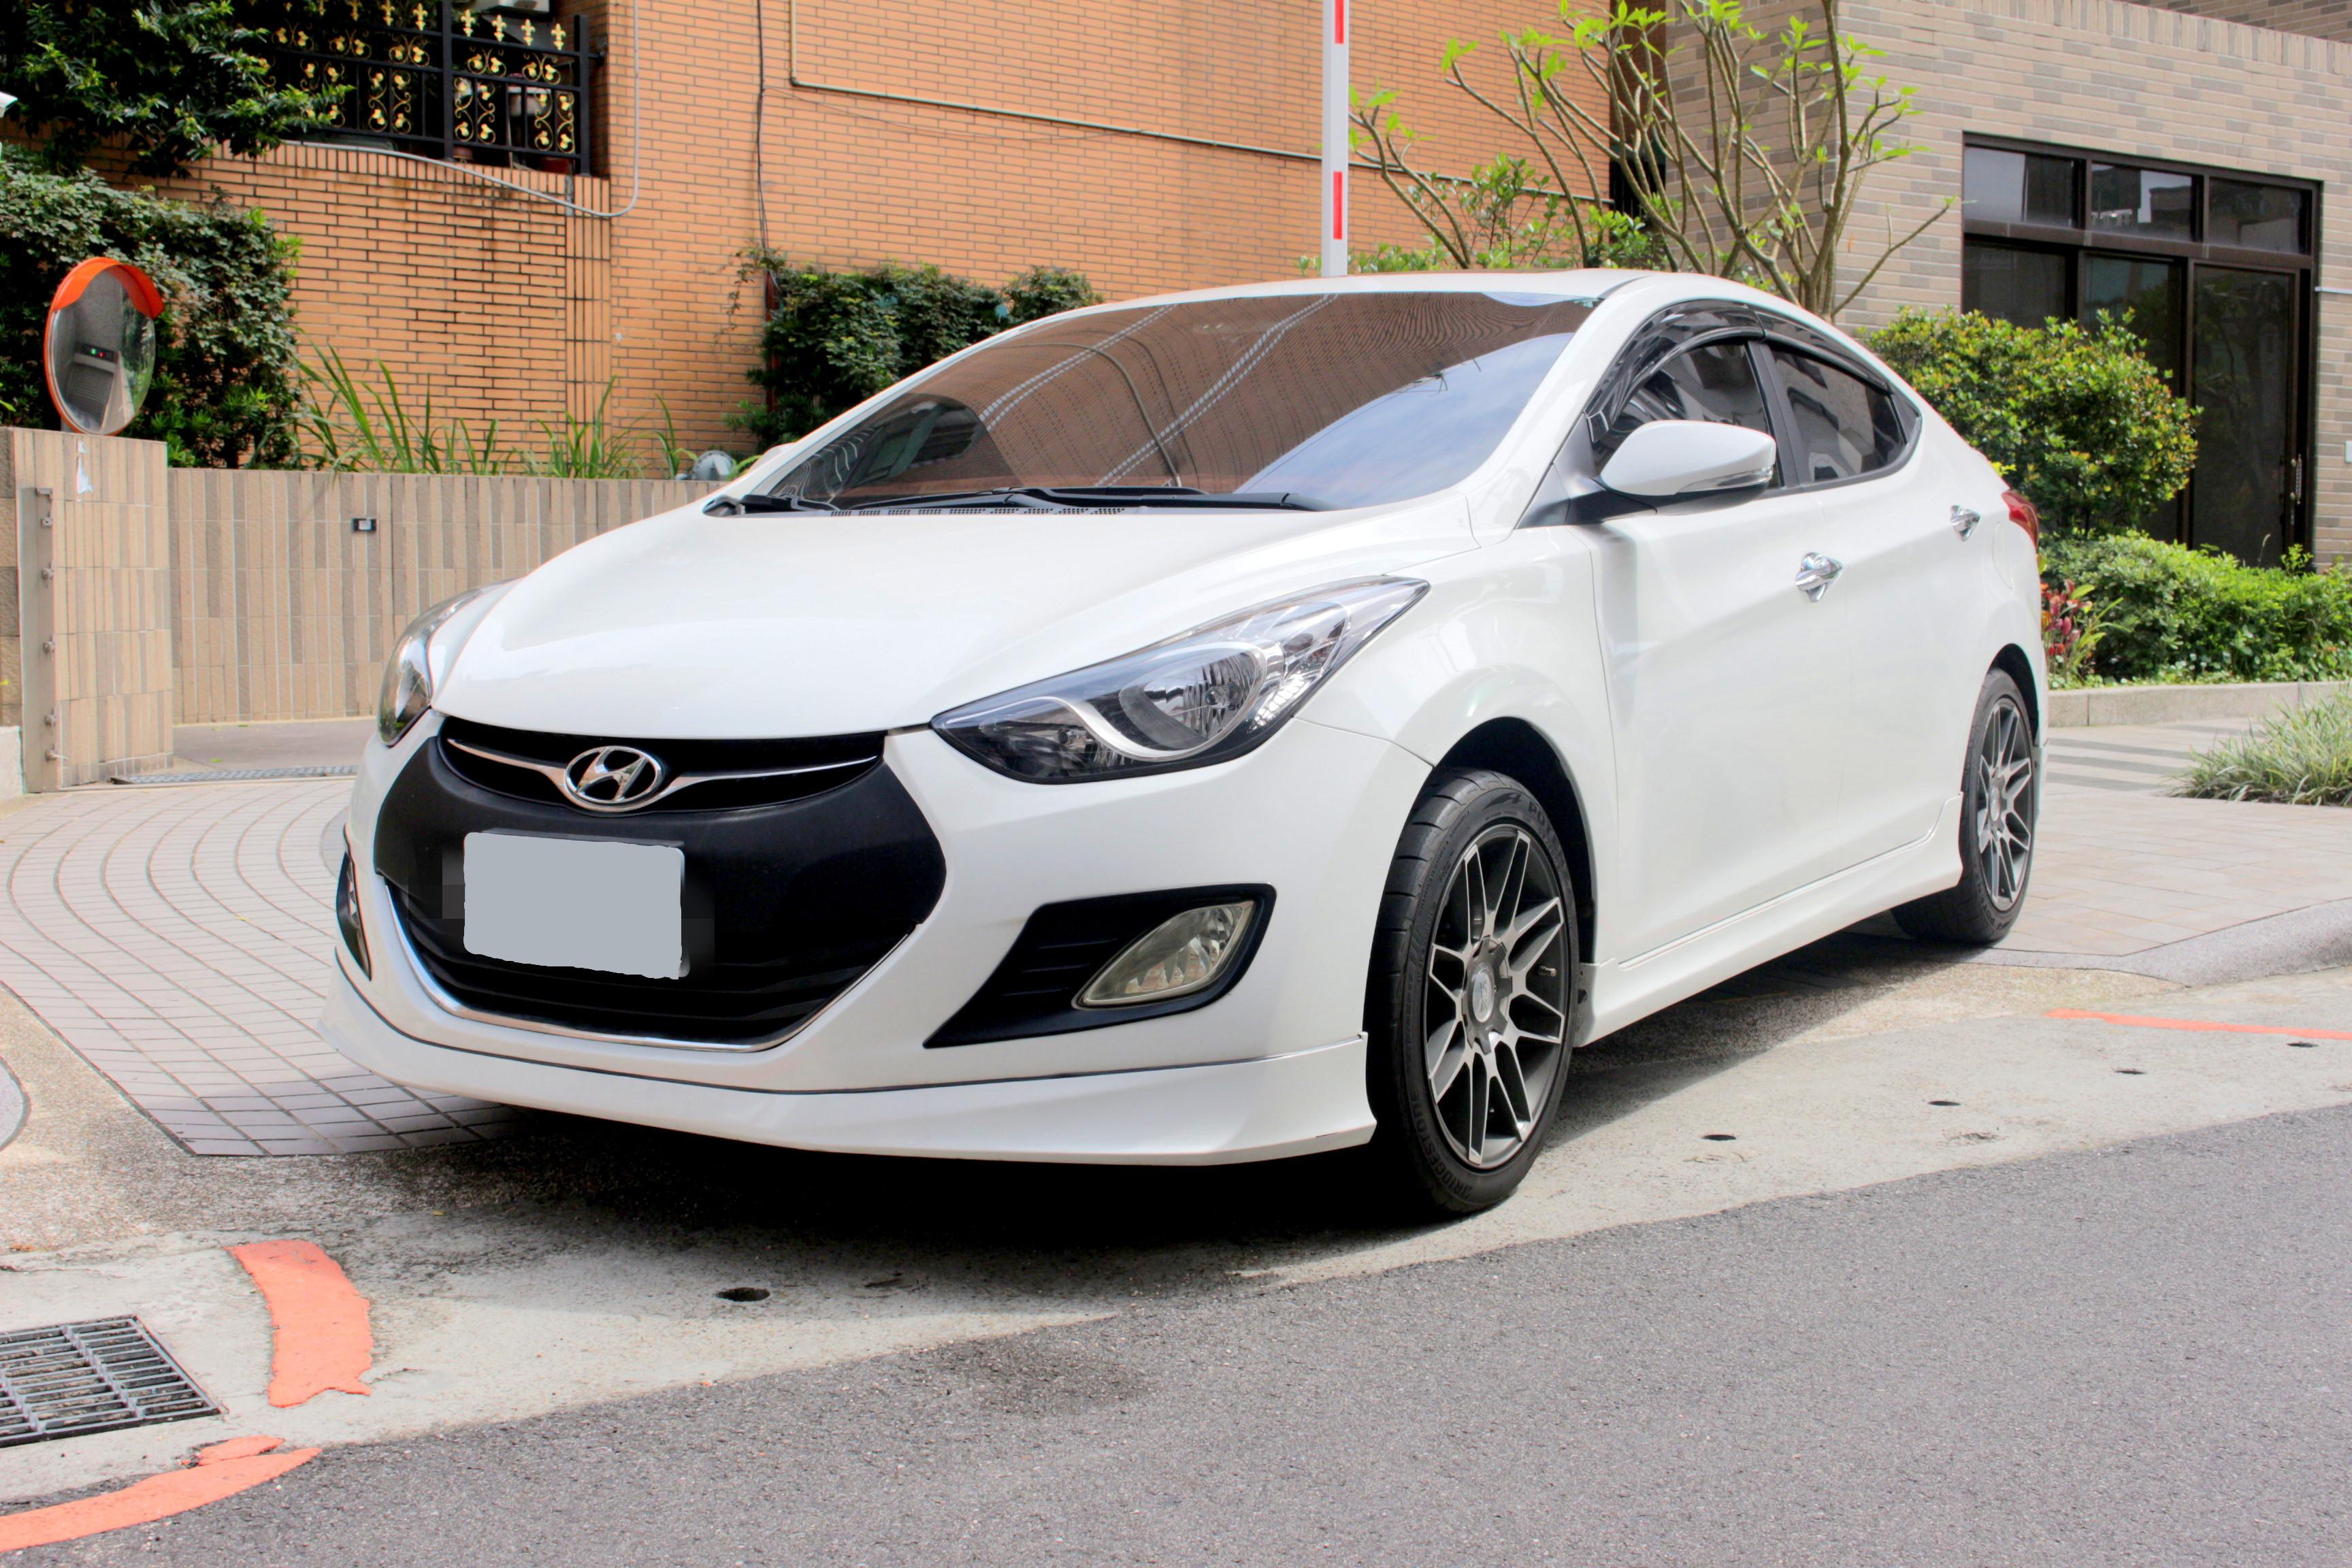 2013 Hyundai 現代 Elantra